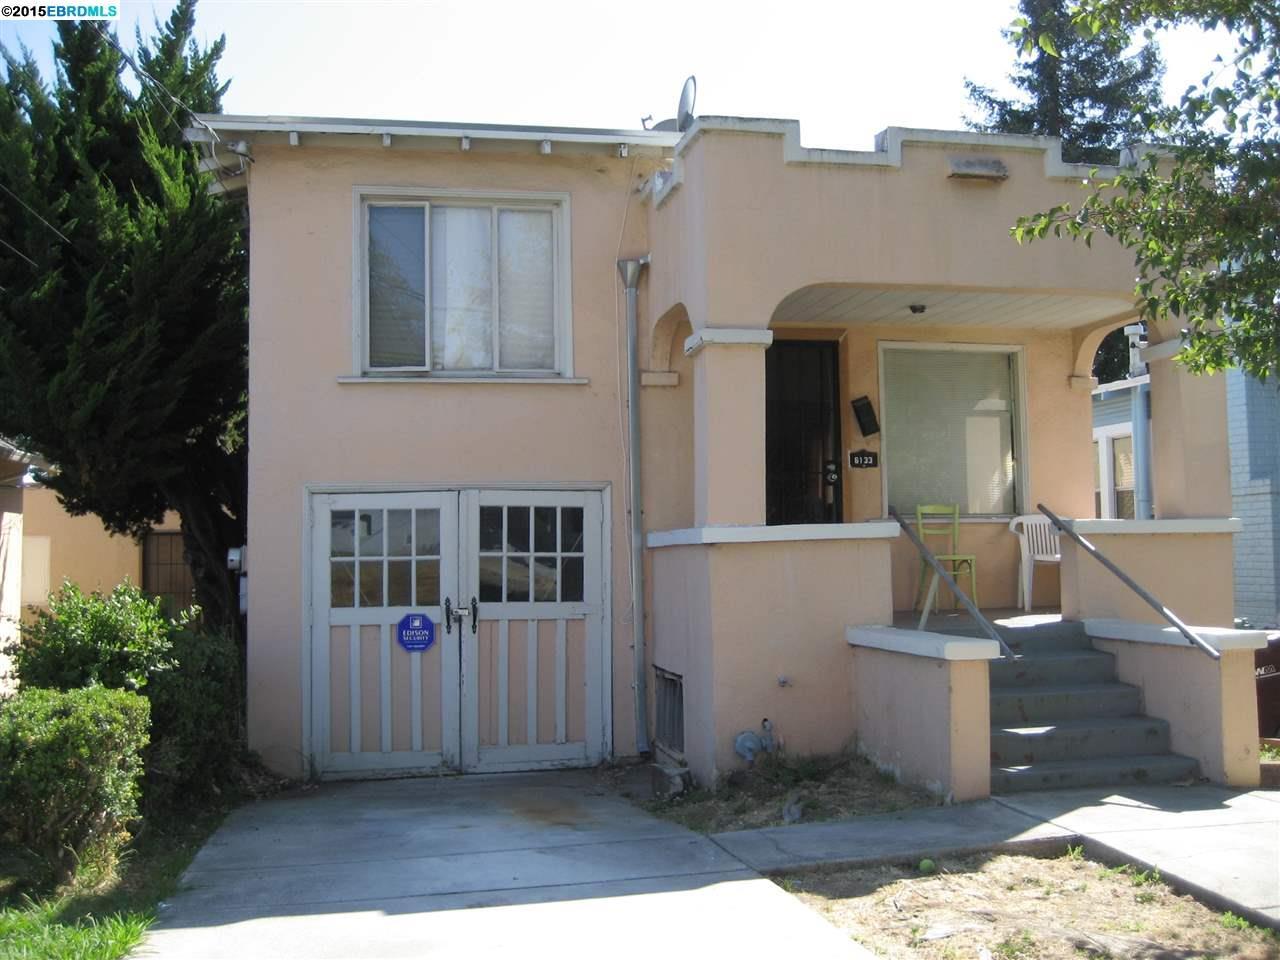 6133 Monadnock Way, Oakland, CA